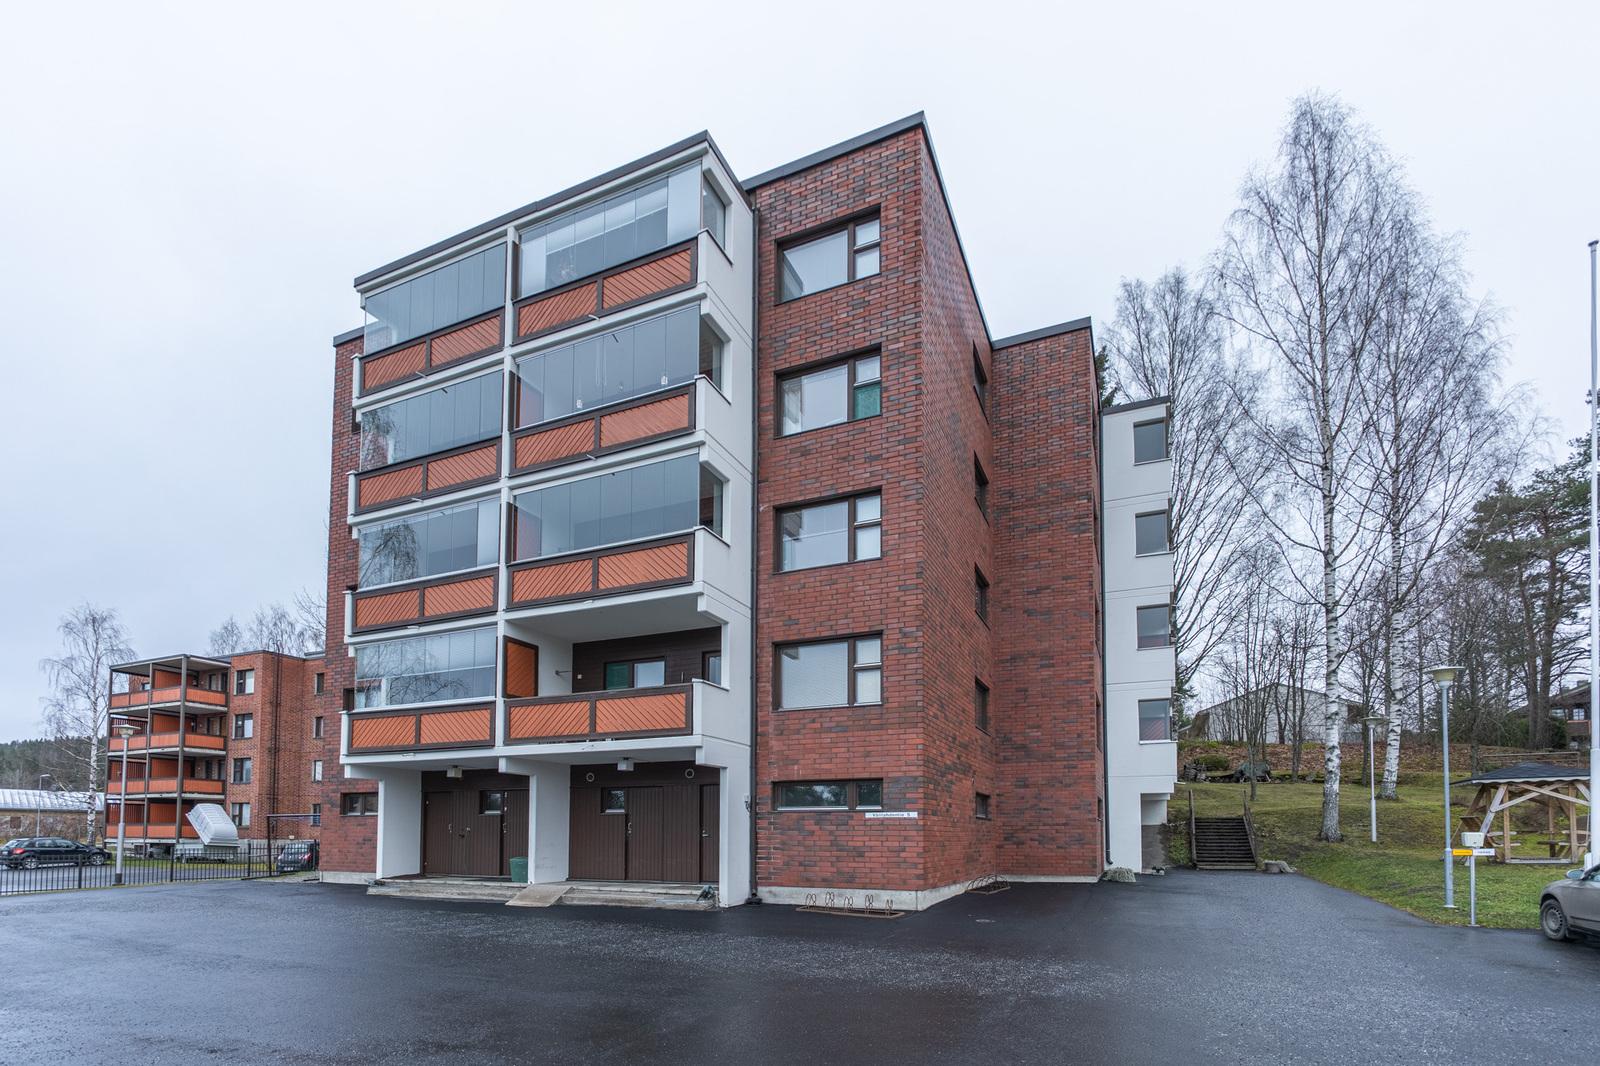 Julkula, Kuopio